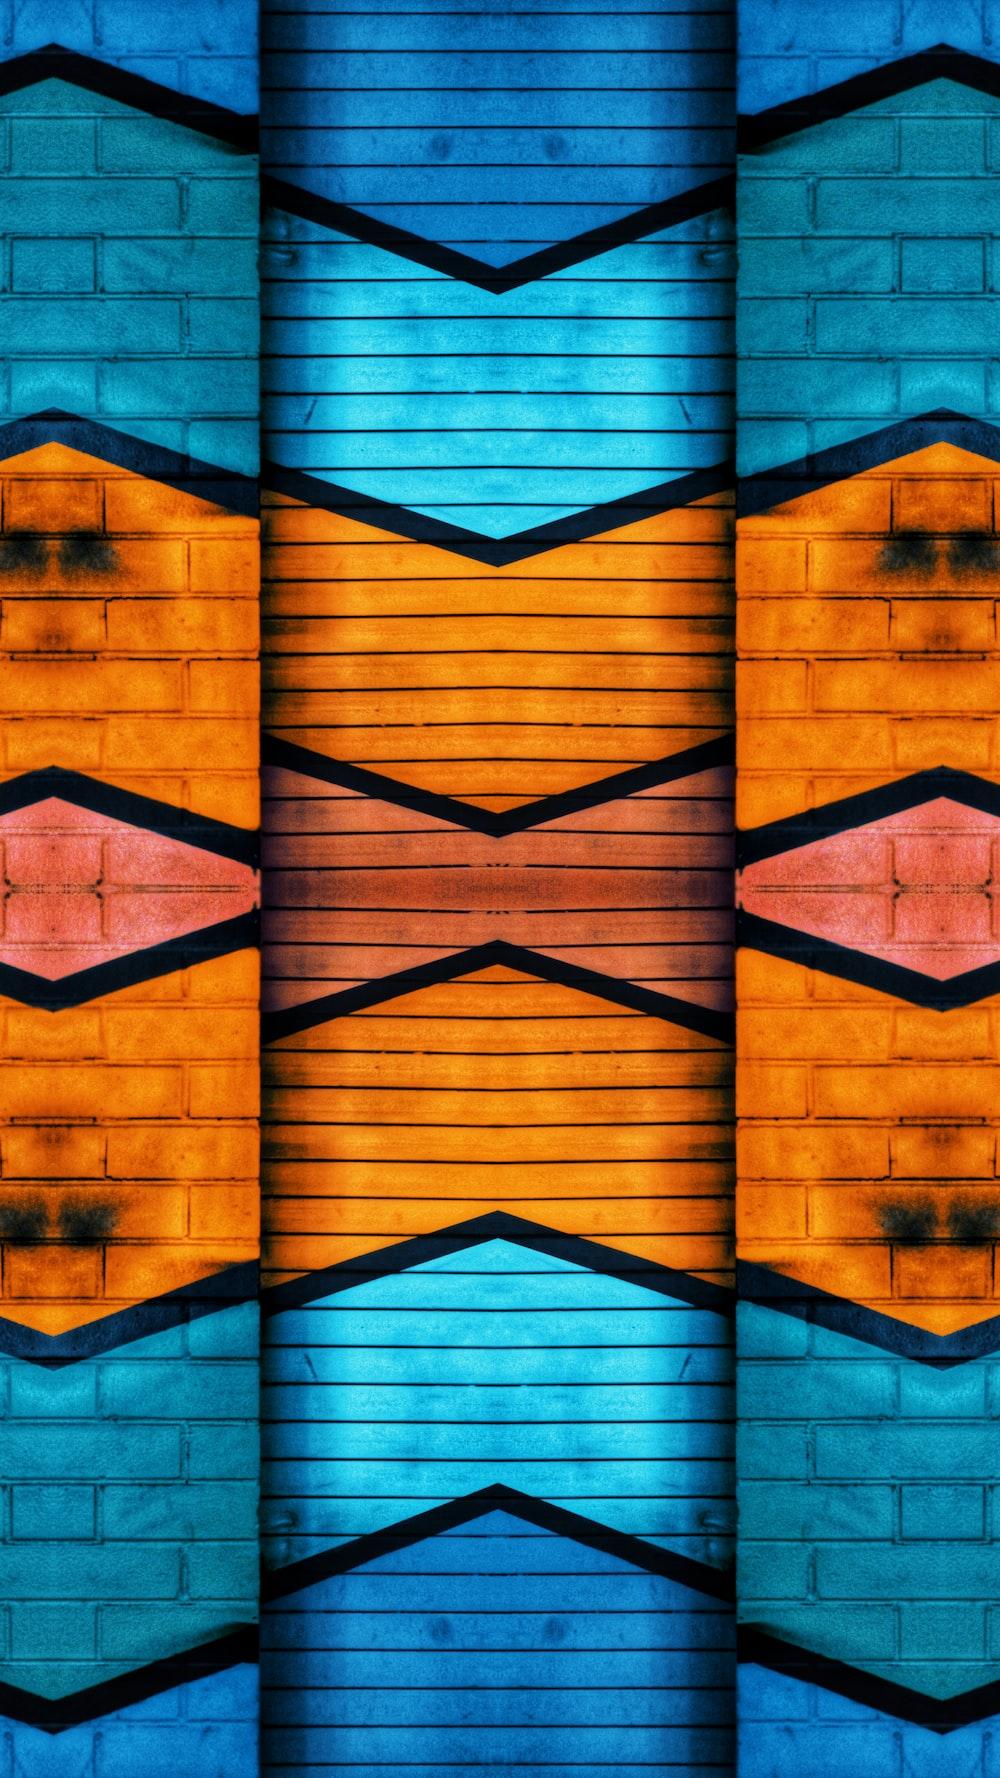 blue and orange brick wall